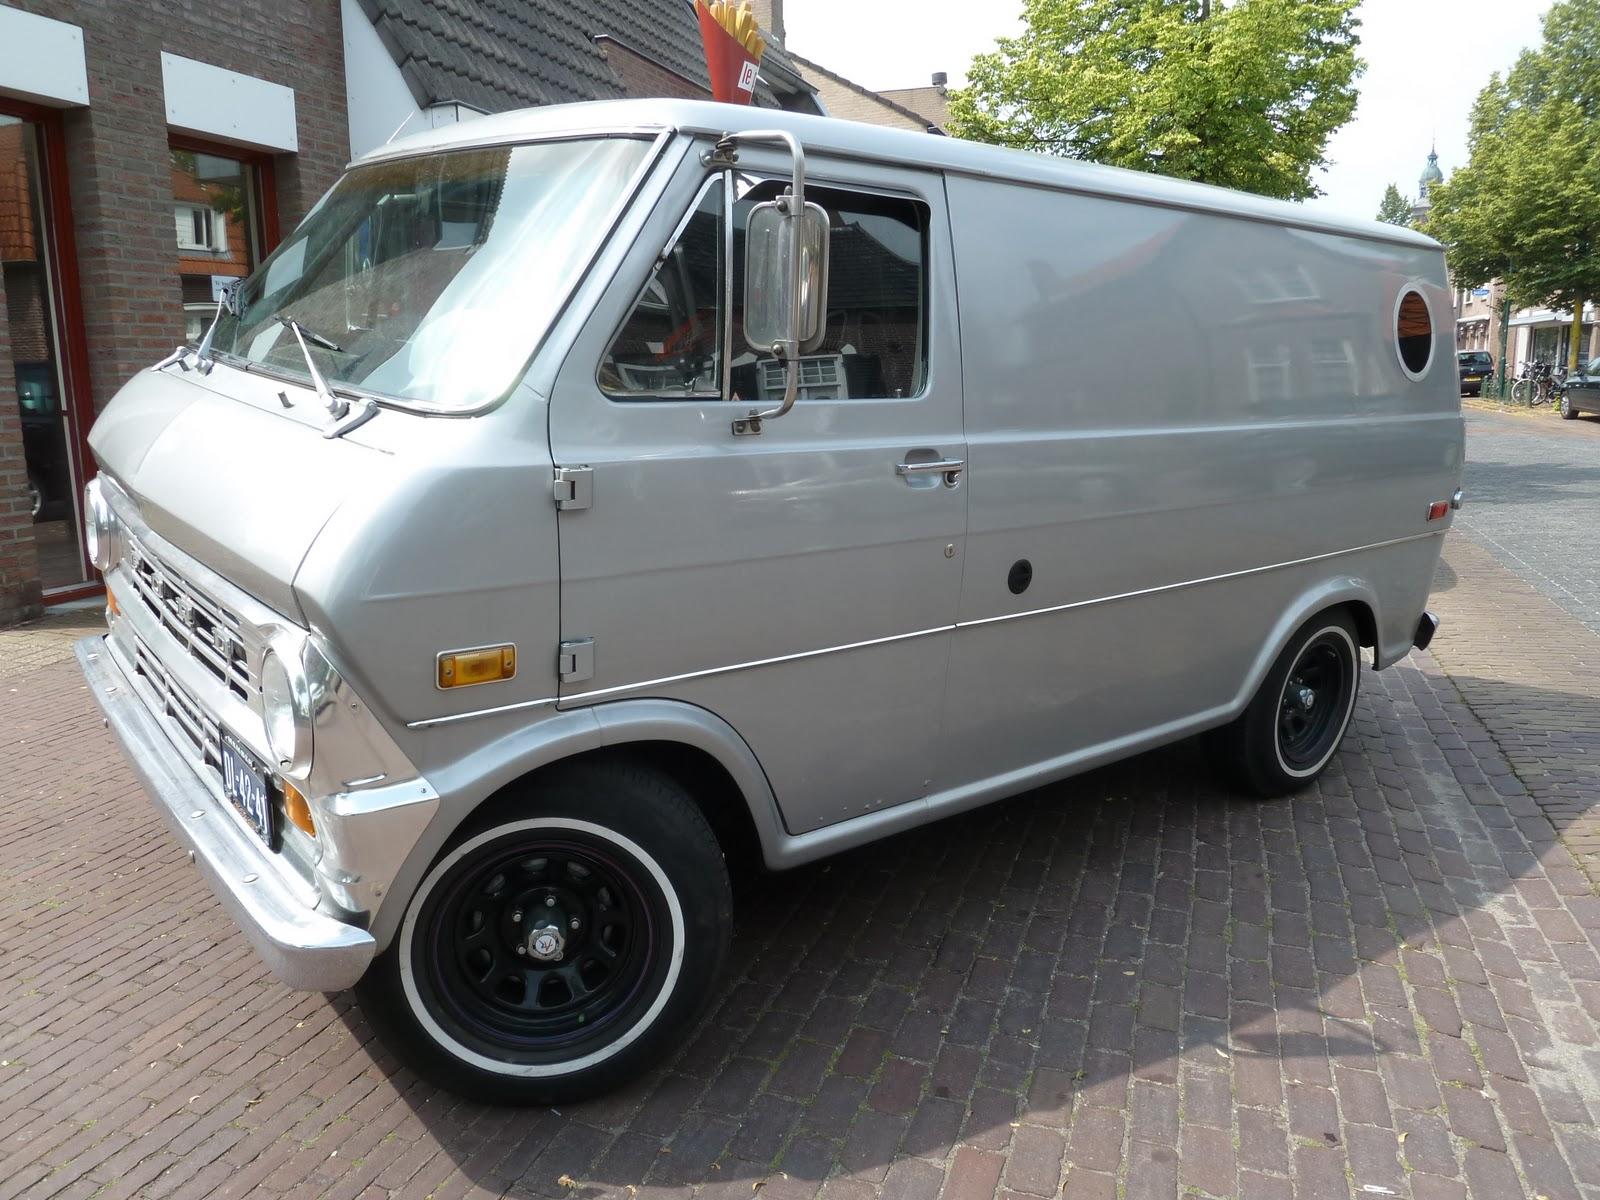 1990 Ford Camper Van >> 1972 Ford Econoline Van - Bing images